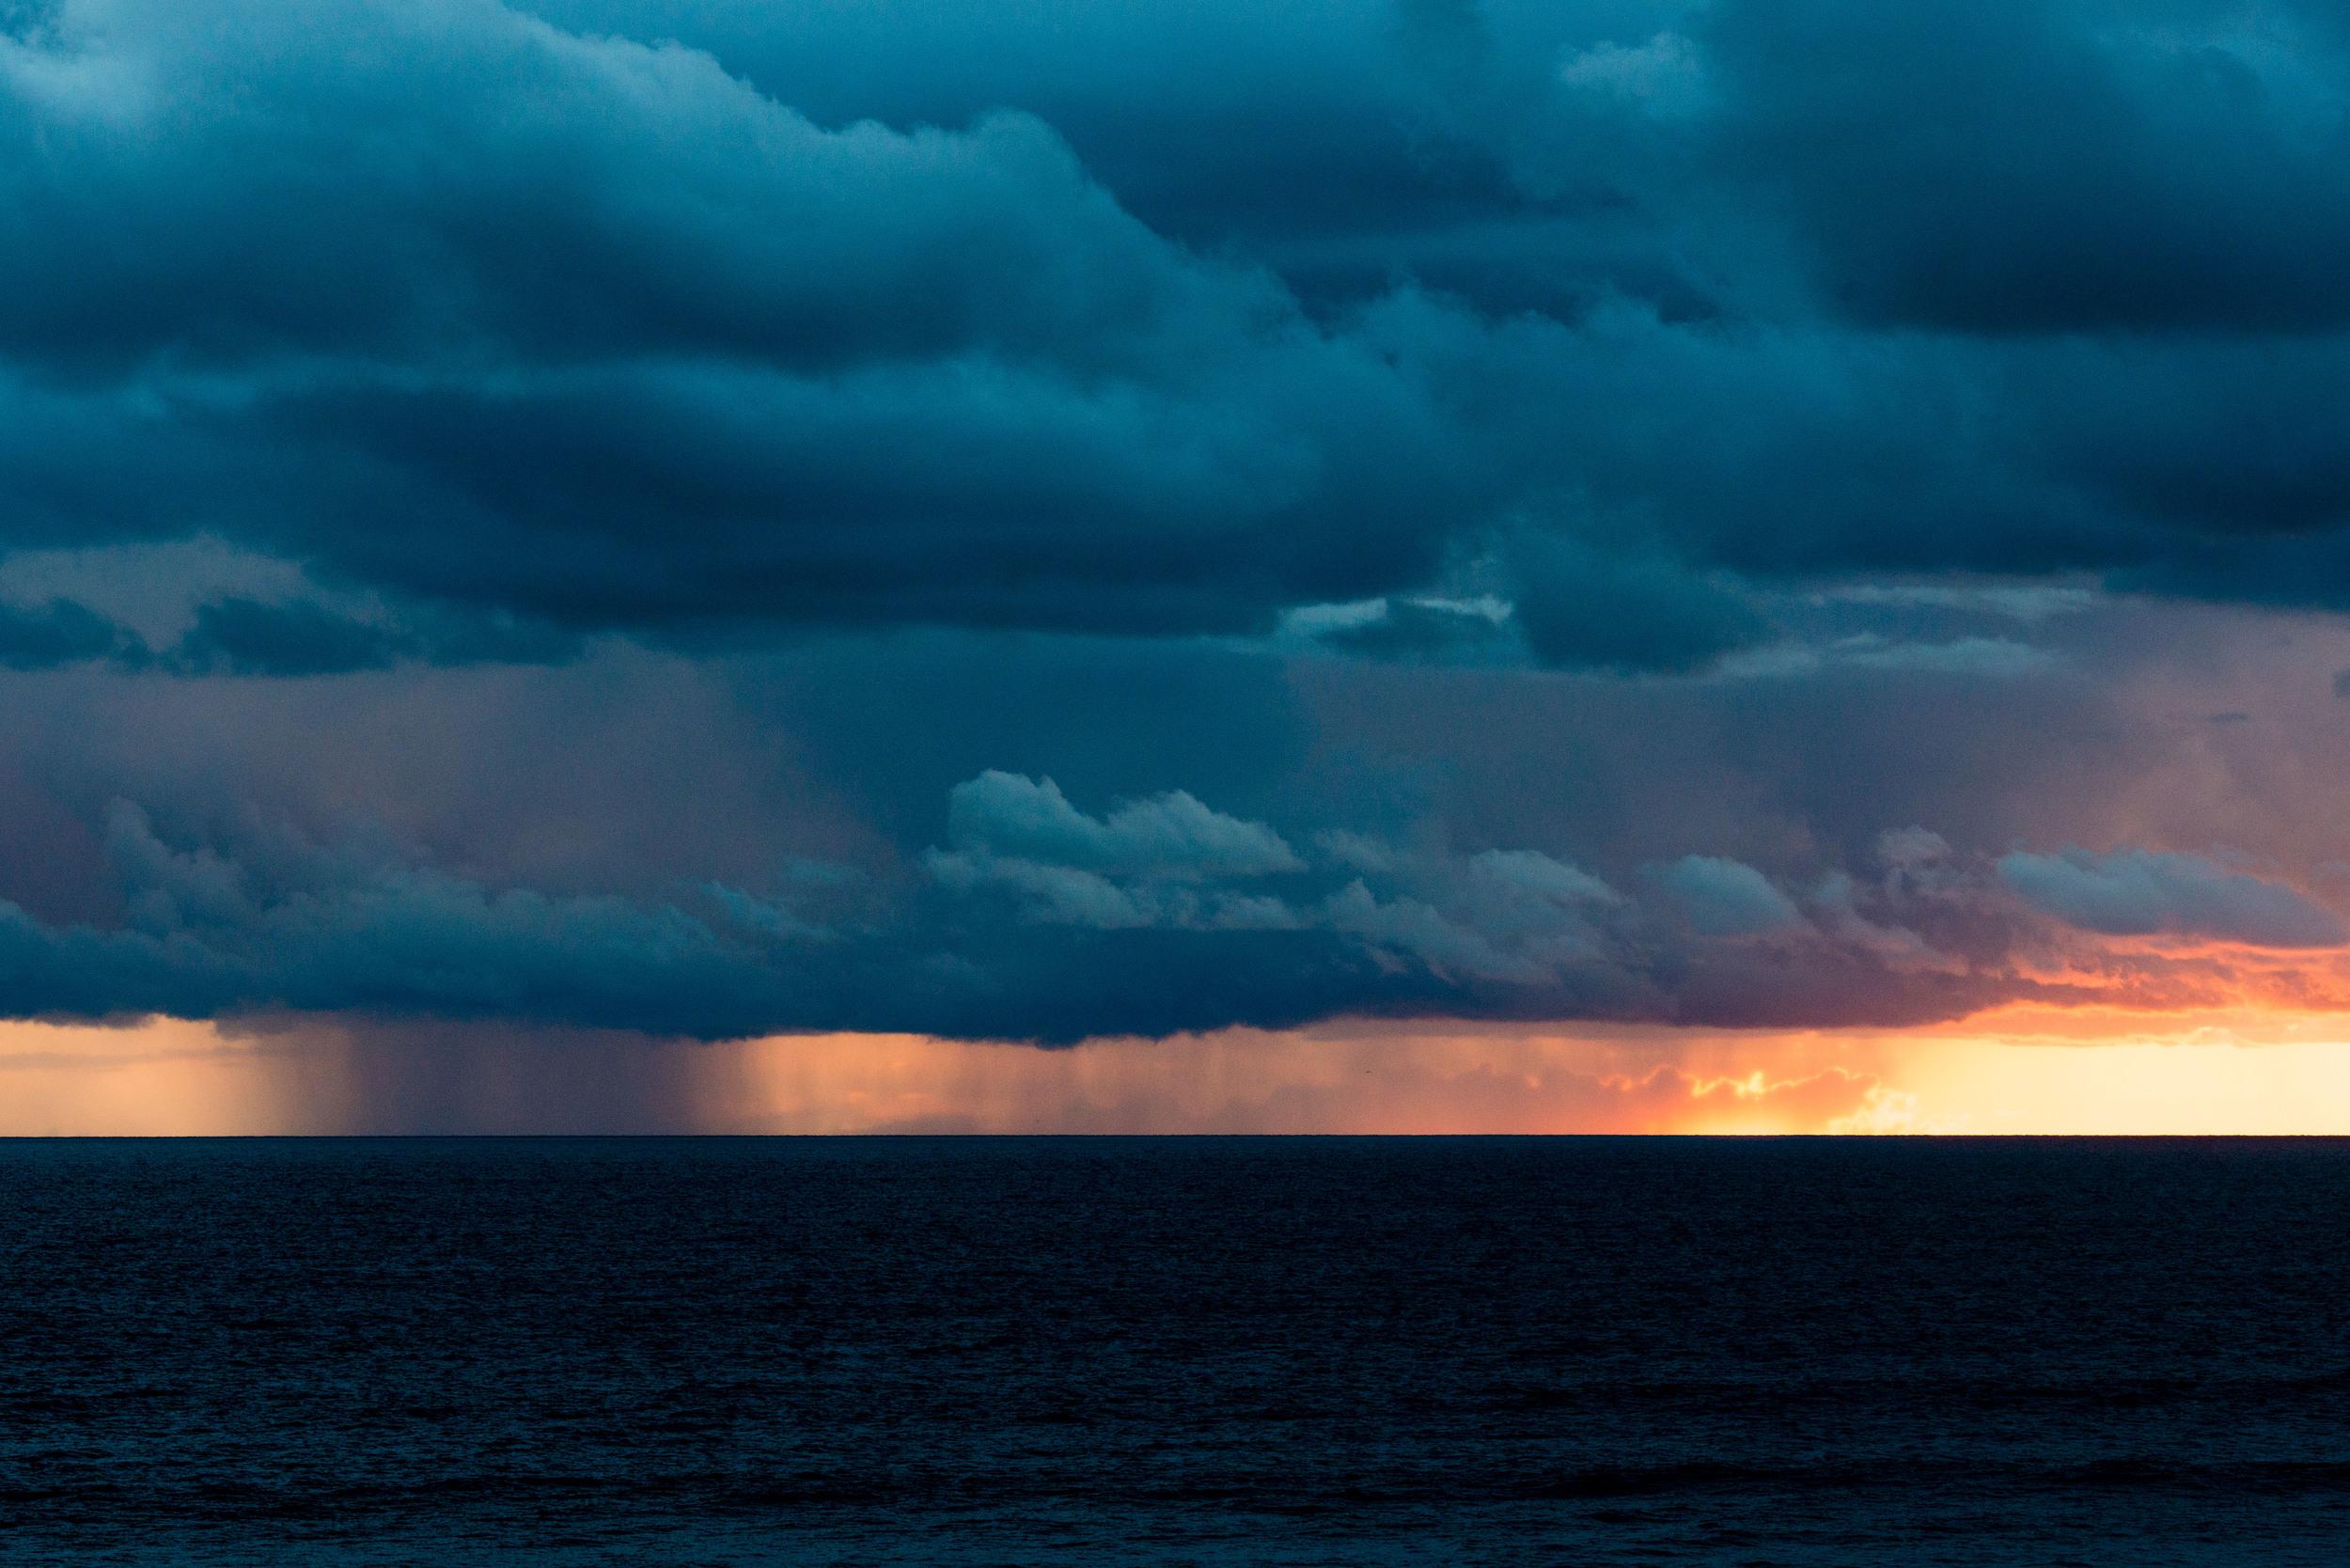 Rain column illuminated by the setting sun in Manhattan Beach, California